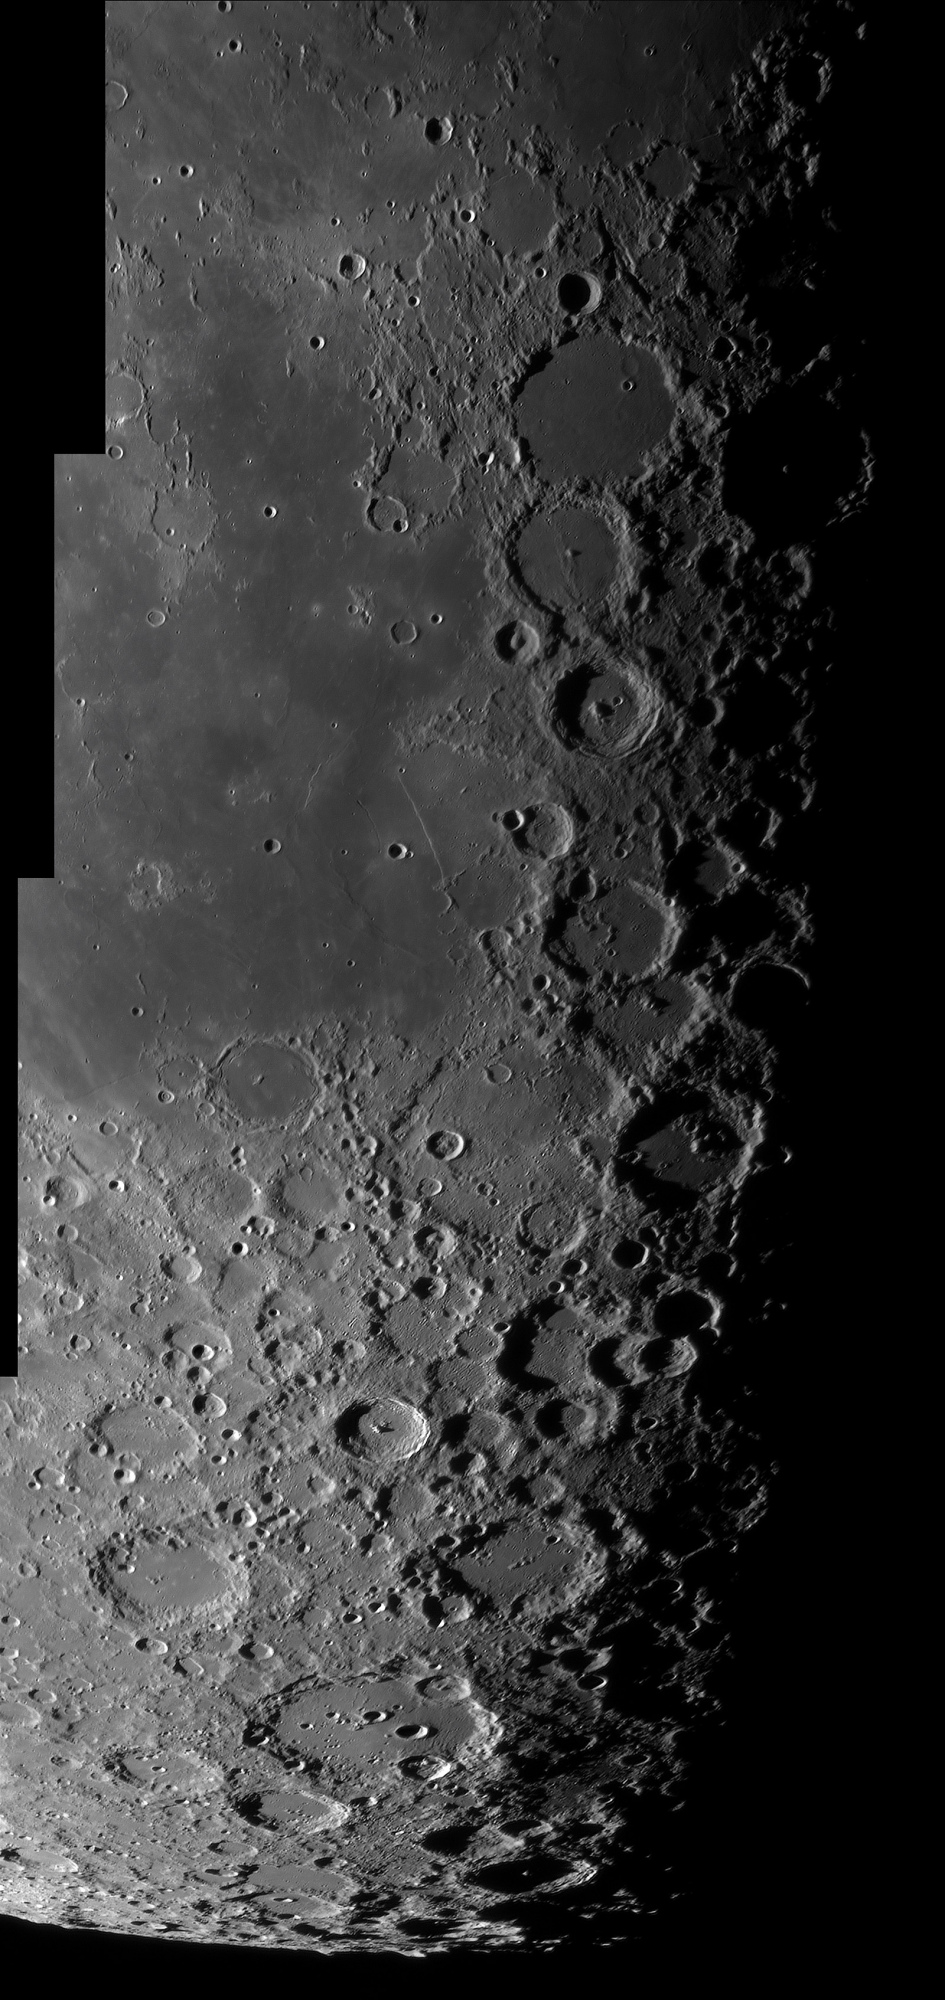 Lune-20190921_Mosa_S-PSmAS.jpg